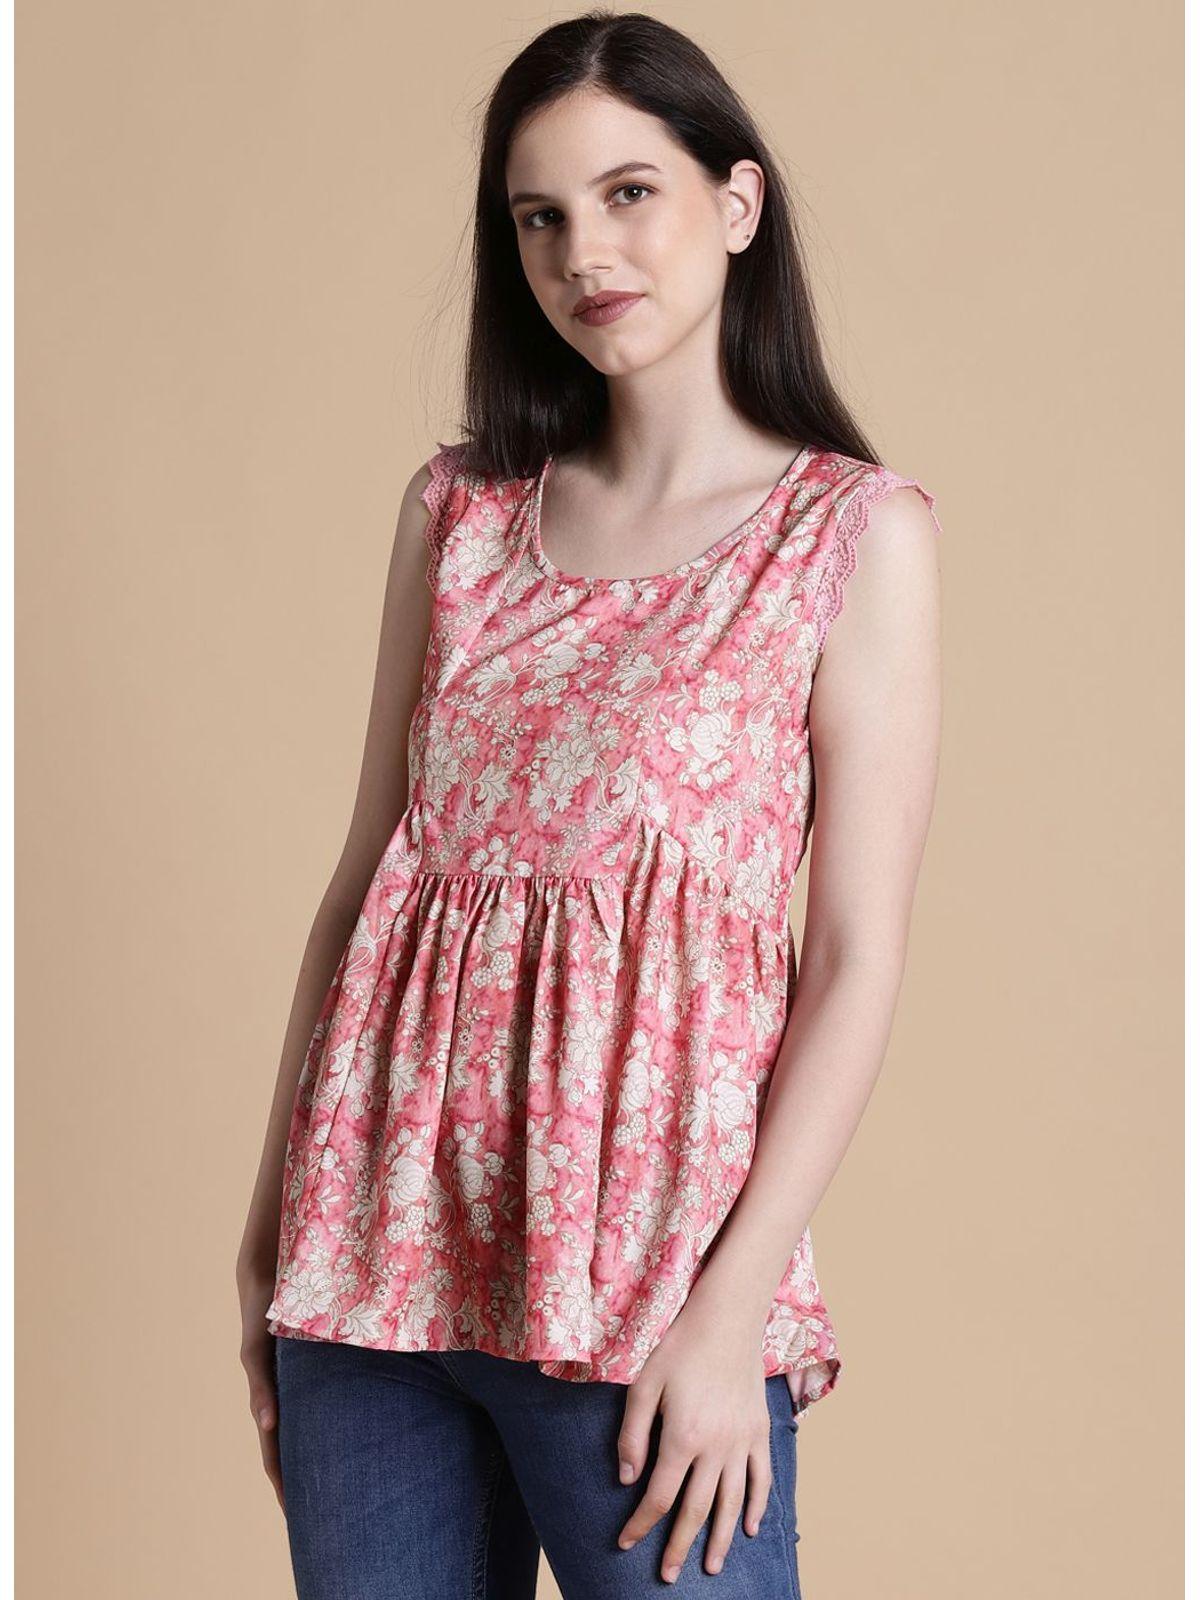 fc898f0ebcb92 Blush Pink Floral Top